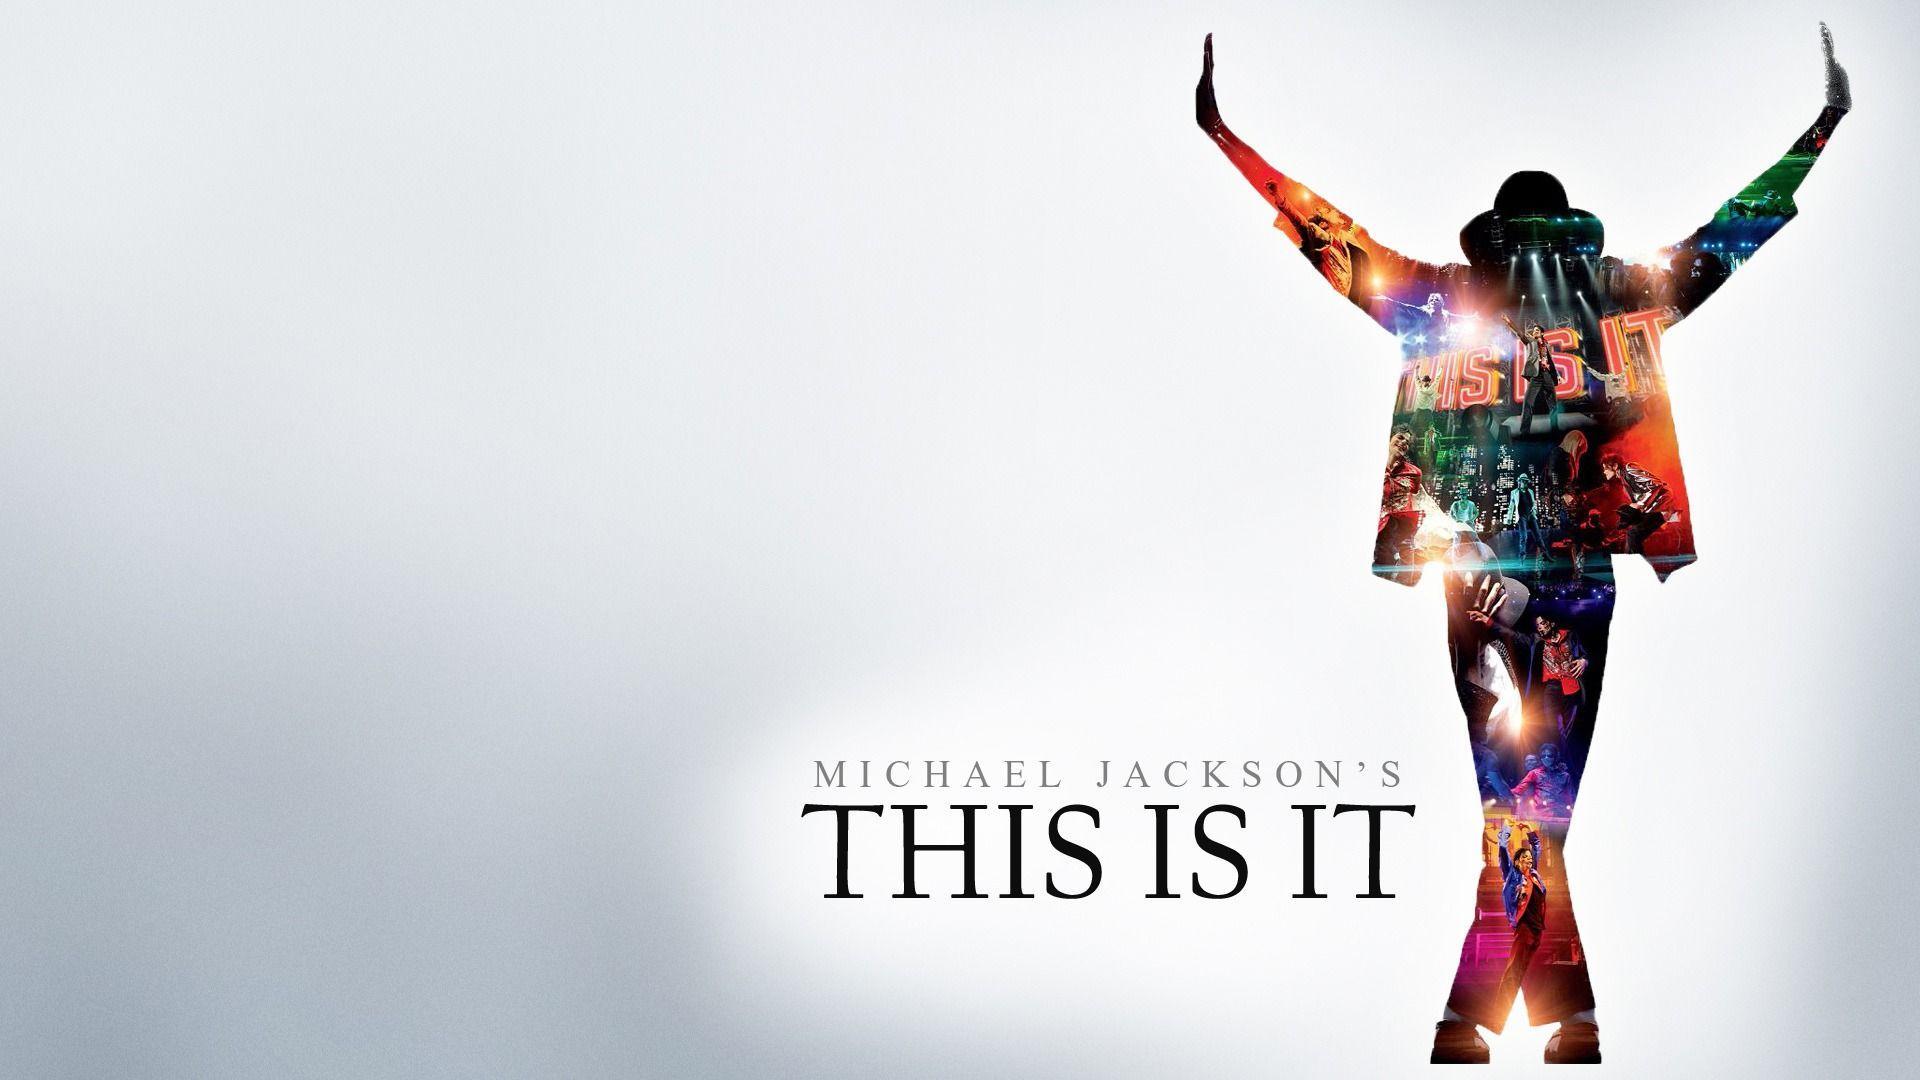 Wallpapers of Michael Jackson - MJ desktop backgrounds